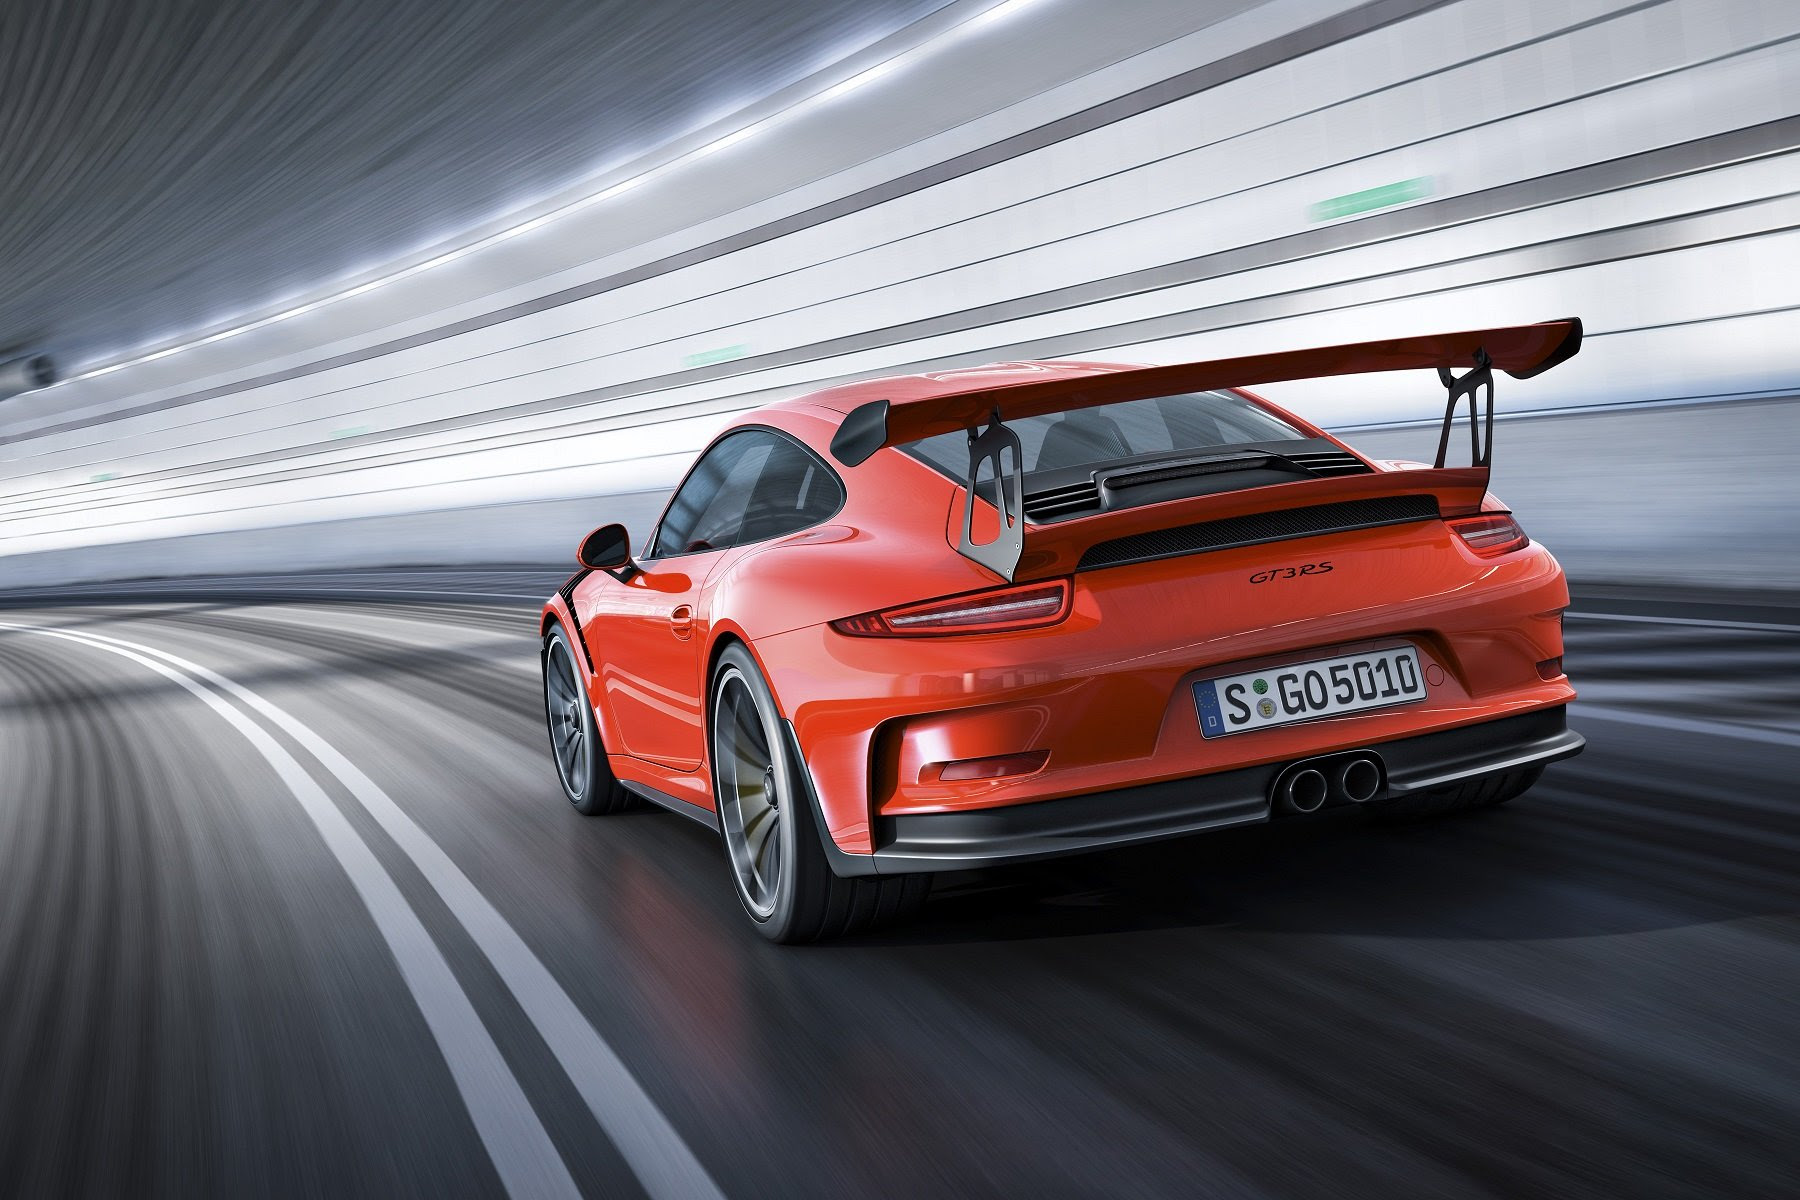 Porsche Gt3 rs Iphone Wallpaper images